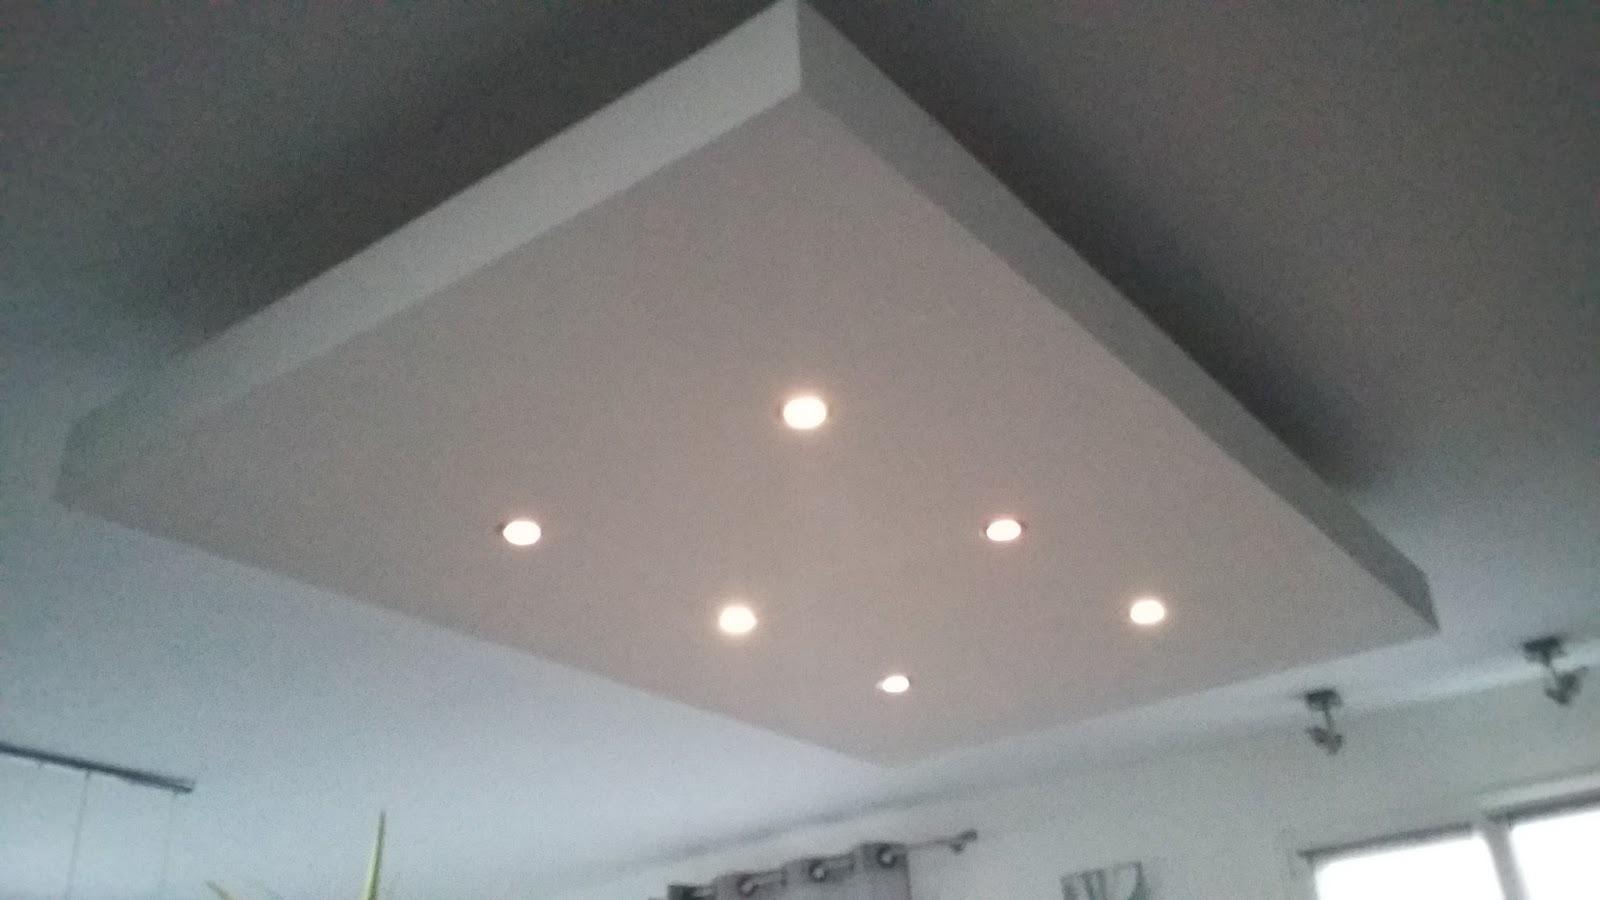 Faux plafond salle de bain spot for Plafond salle de bain moisi